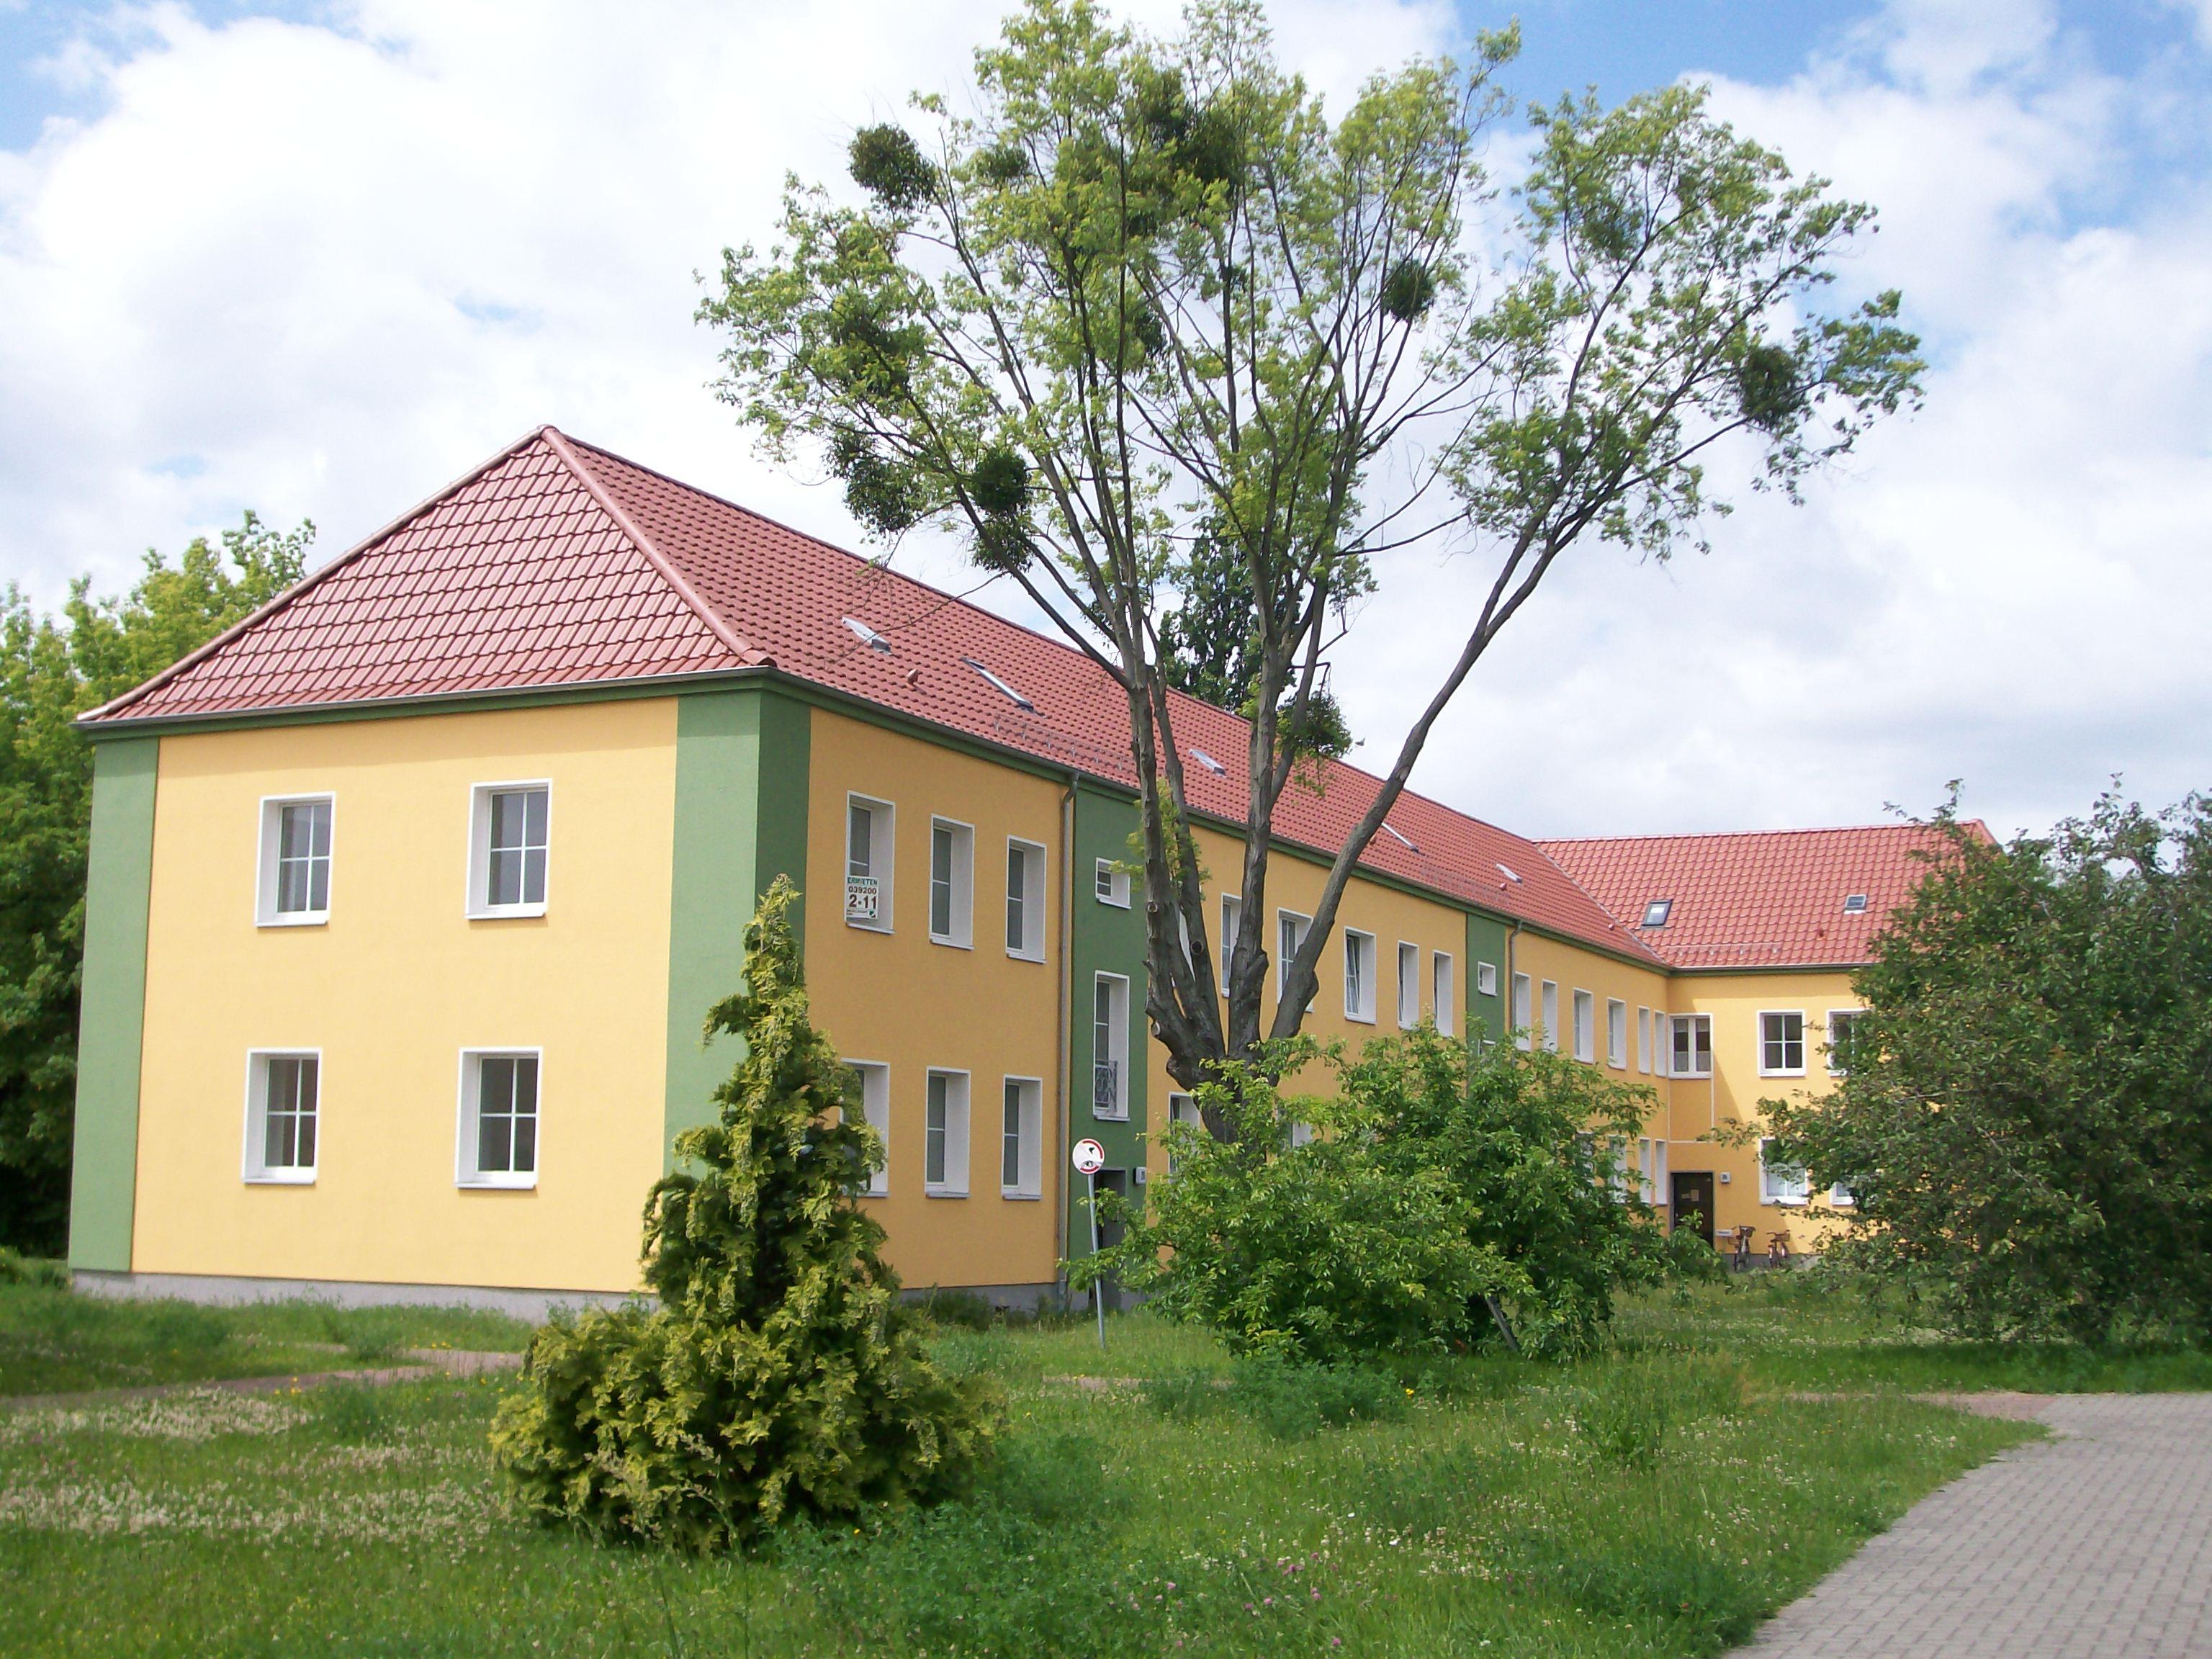 Wohnung - Magdeburger Straße 24